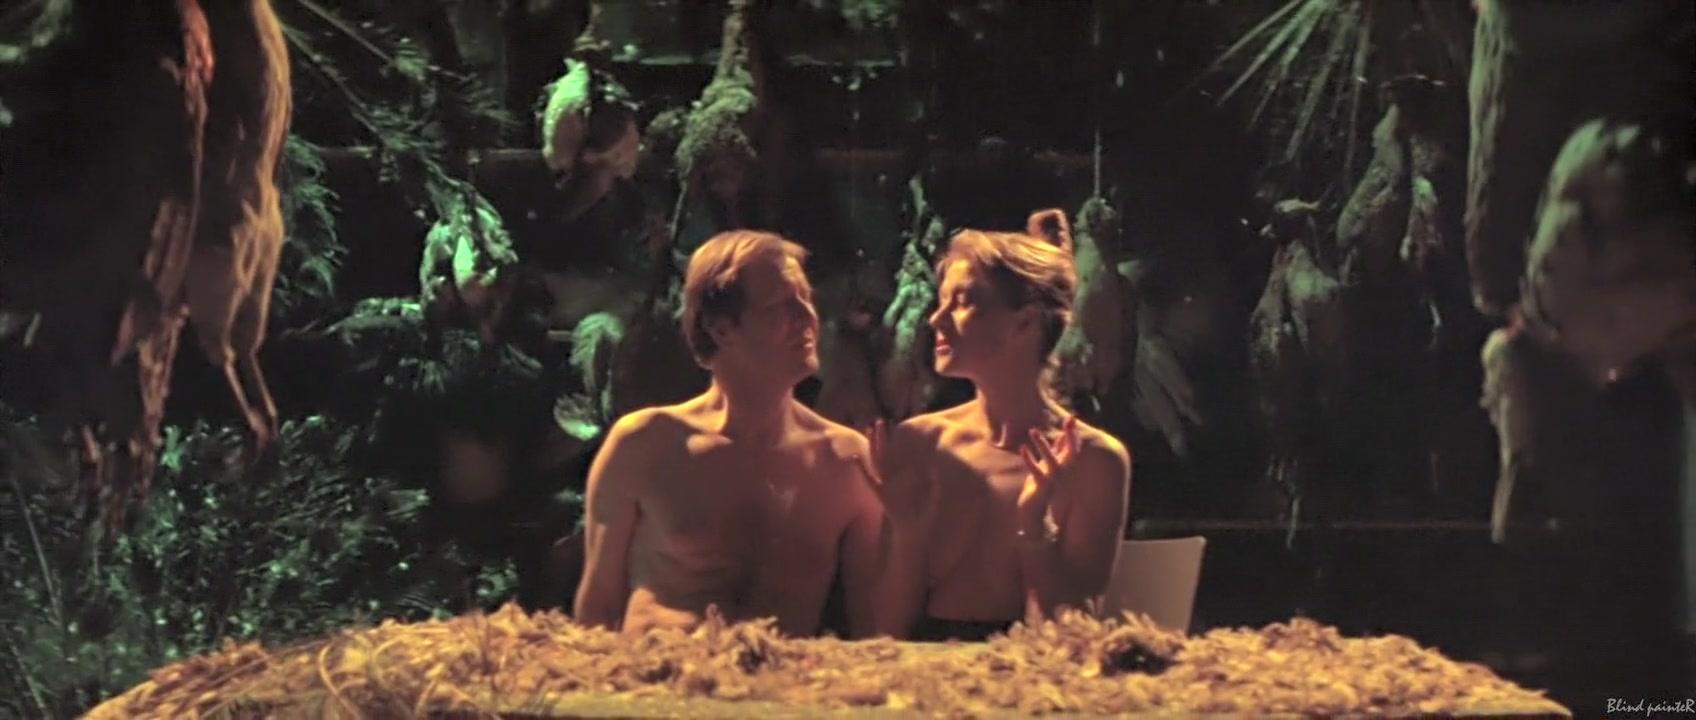 Pron Videos Ex novia bbw culona super sexy